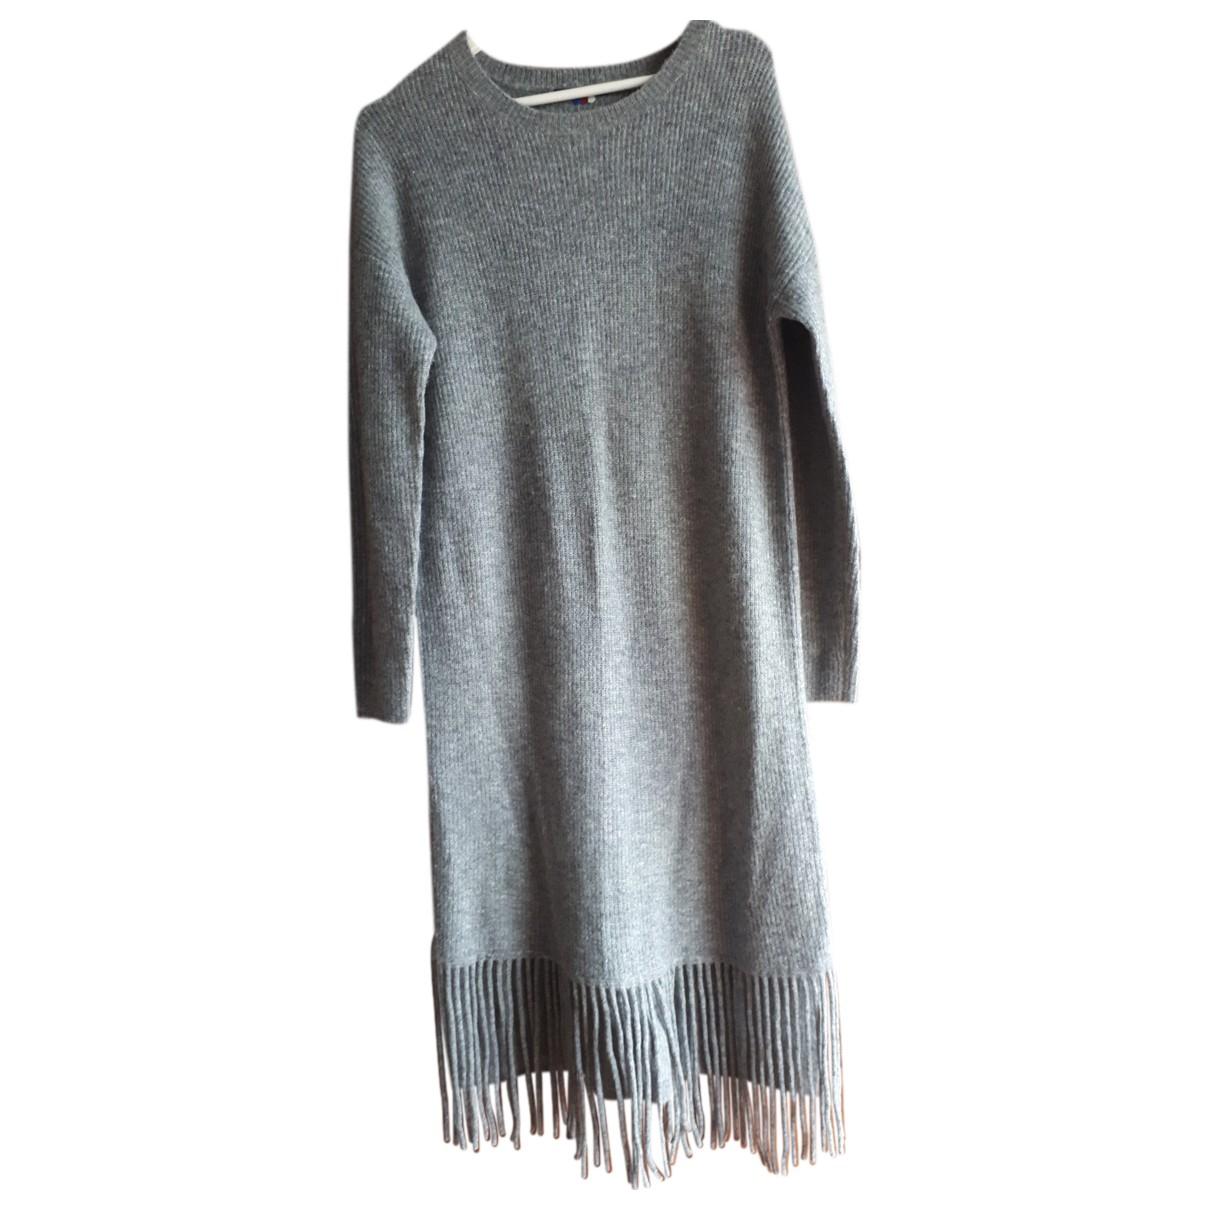 Autre Marque \N Kleid in  Grau Viskose